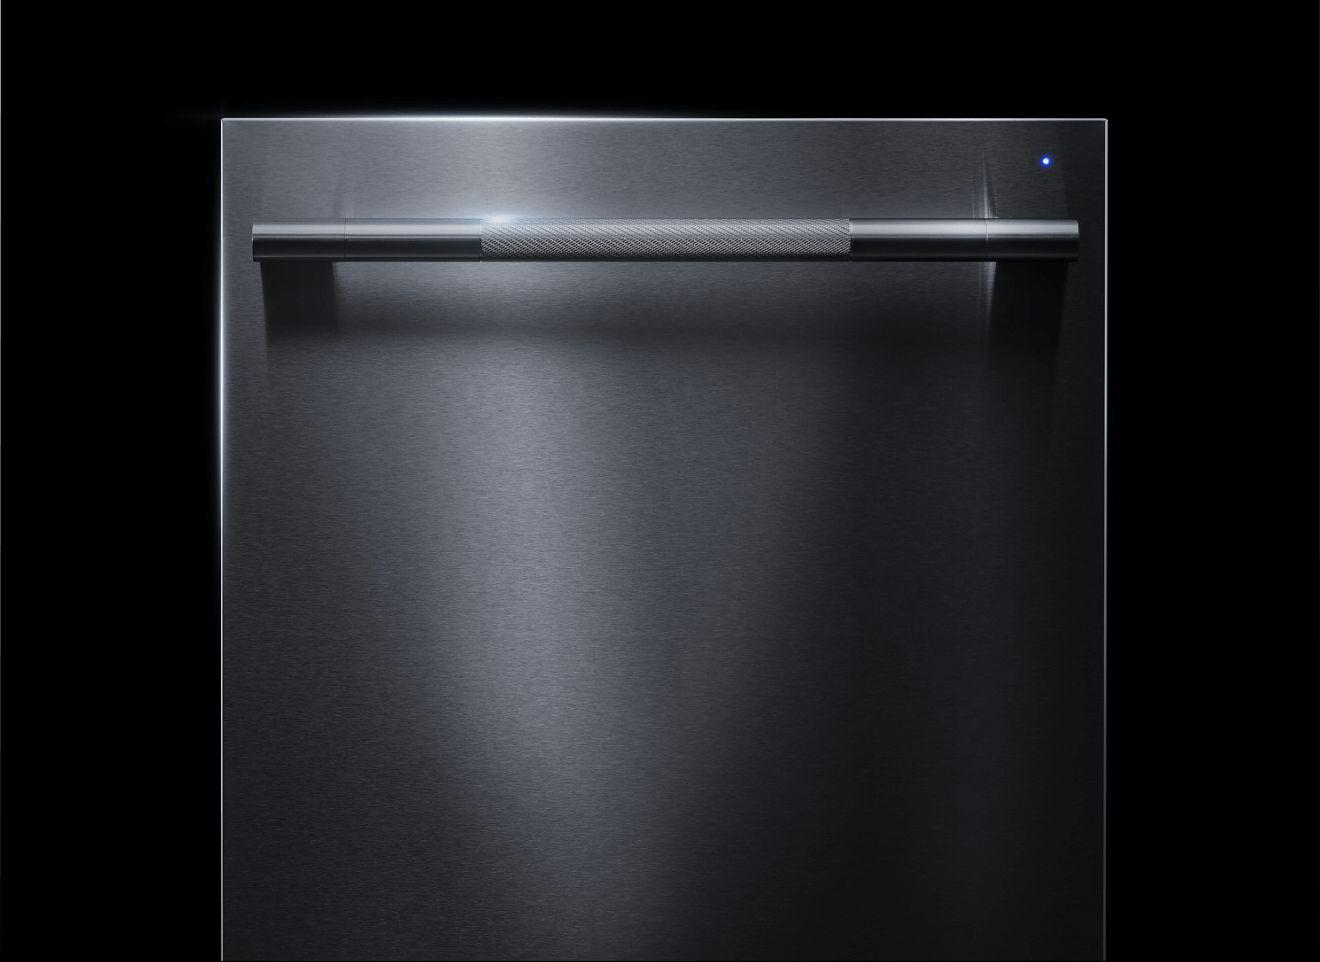 A RISE™ Dishwasher.